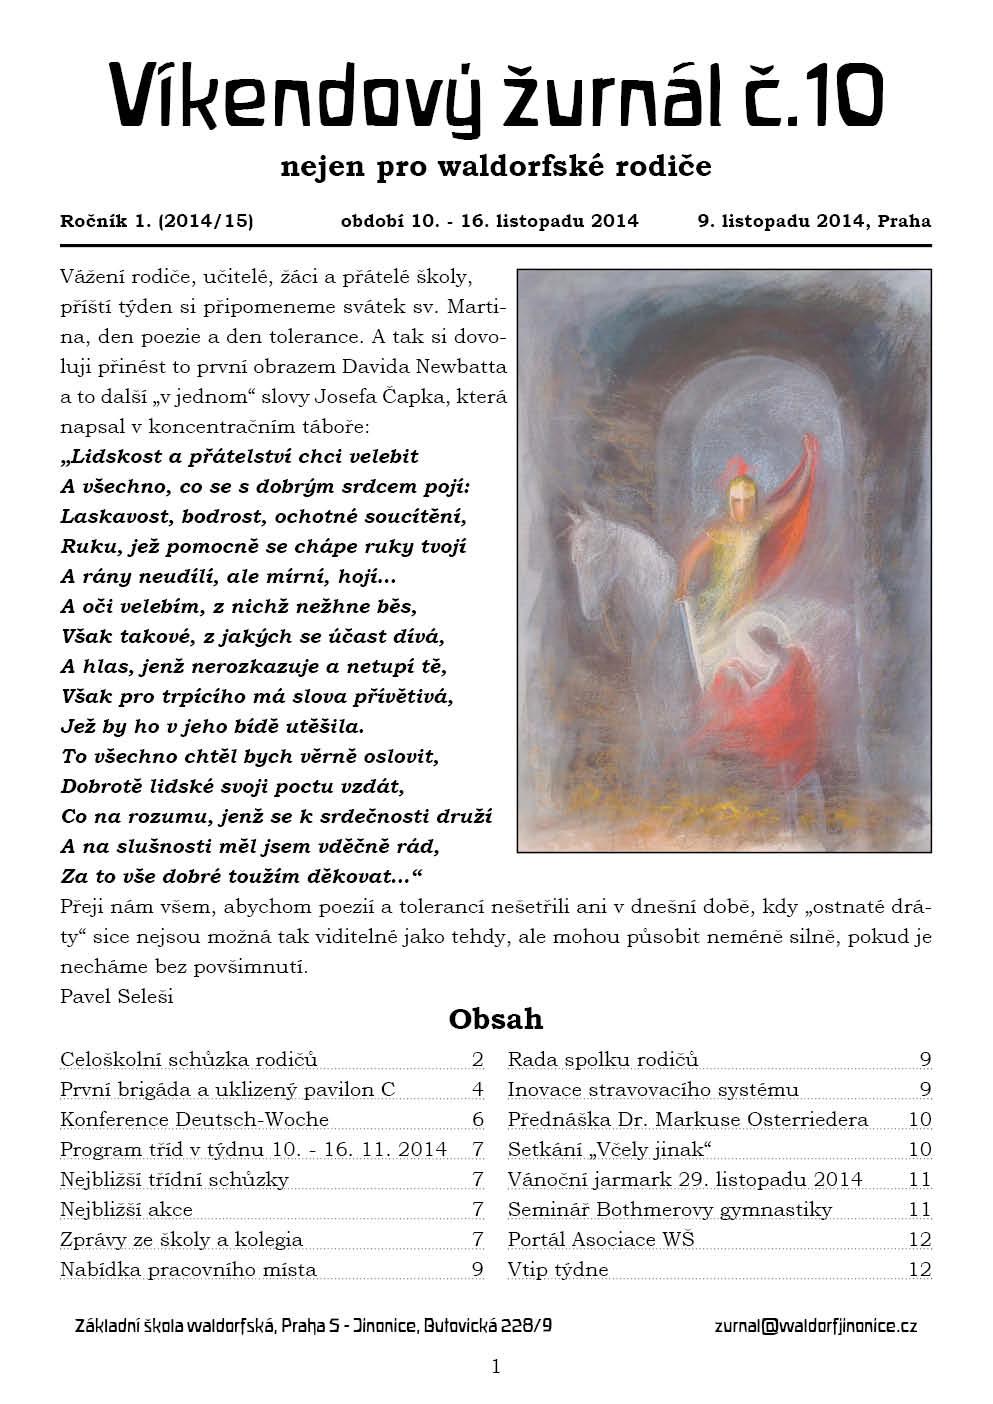 Žurnál 1.10